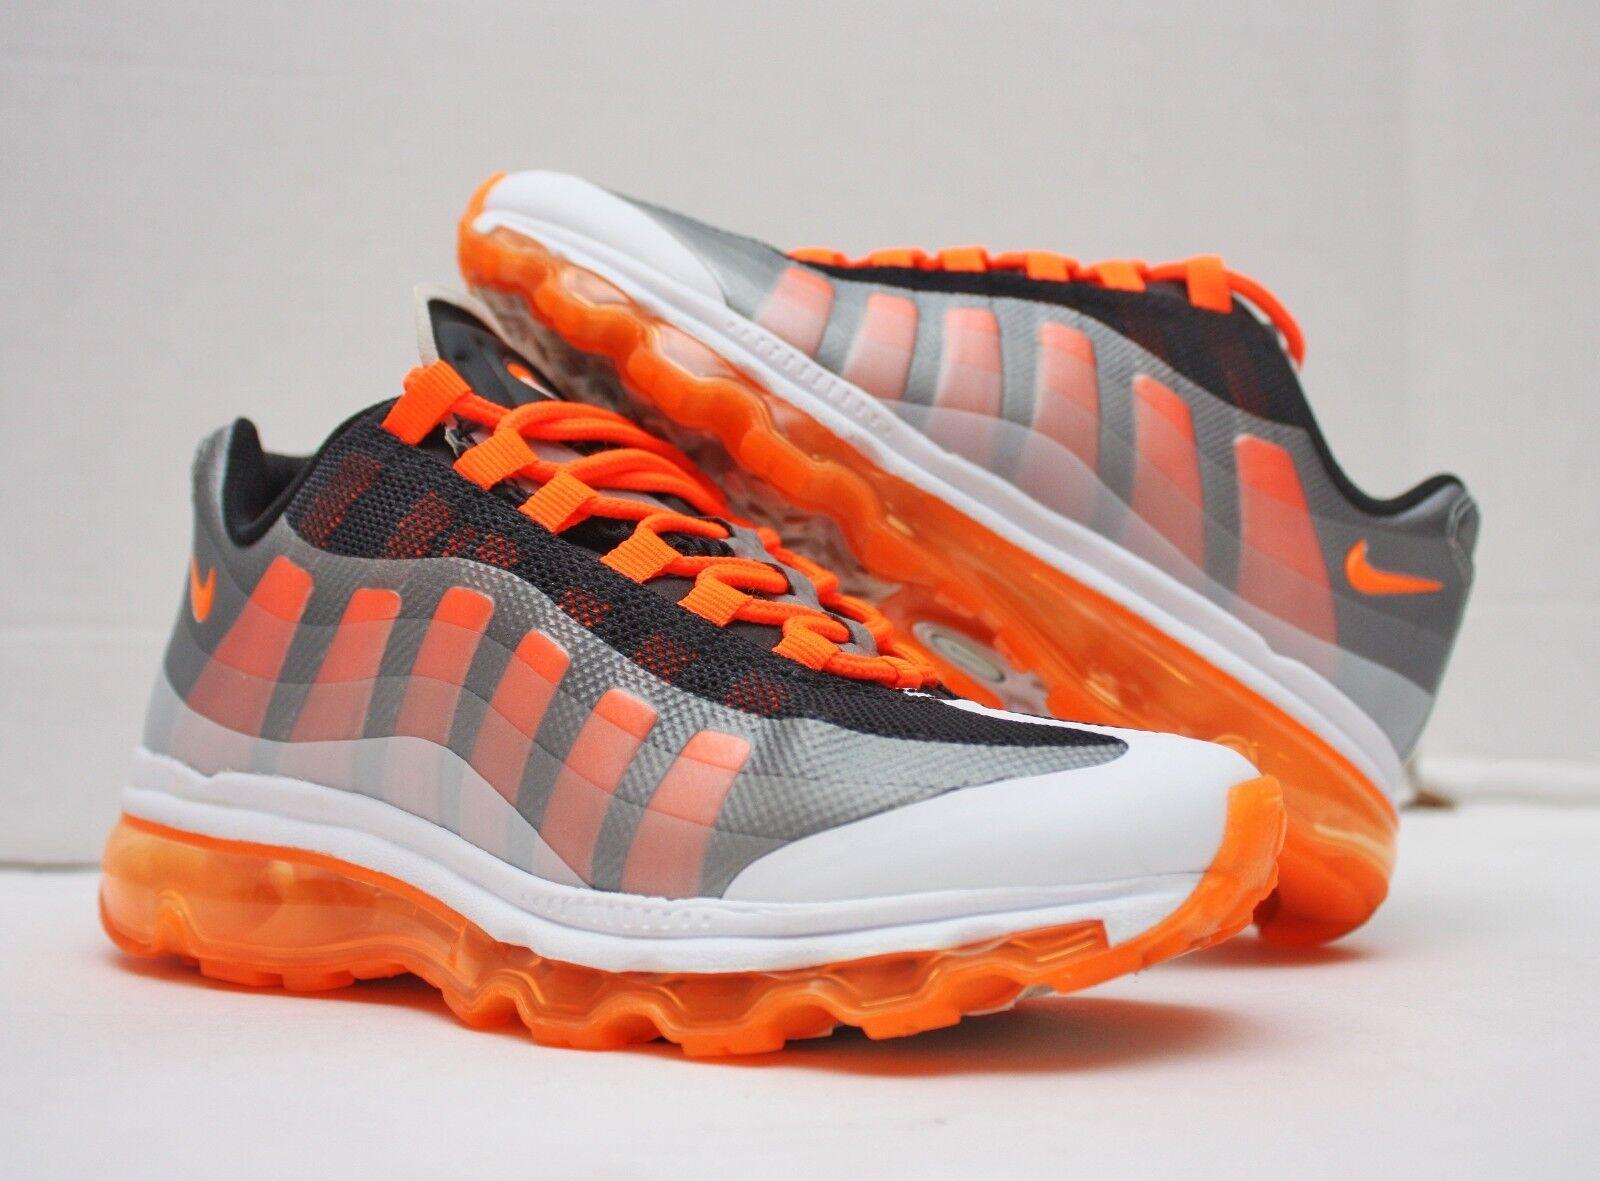 2012 Nike Air Max 95 + Plus BB Storlek 4Y - Vit Orange Silver - 512169 007